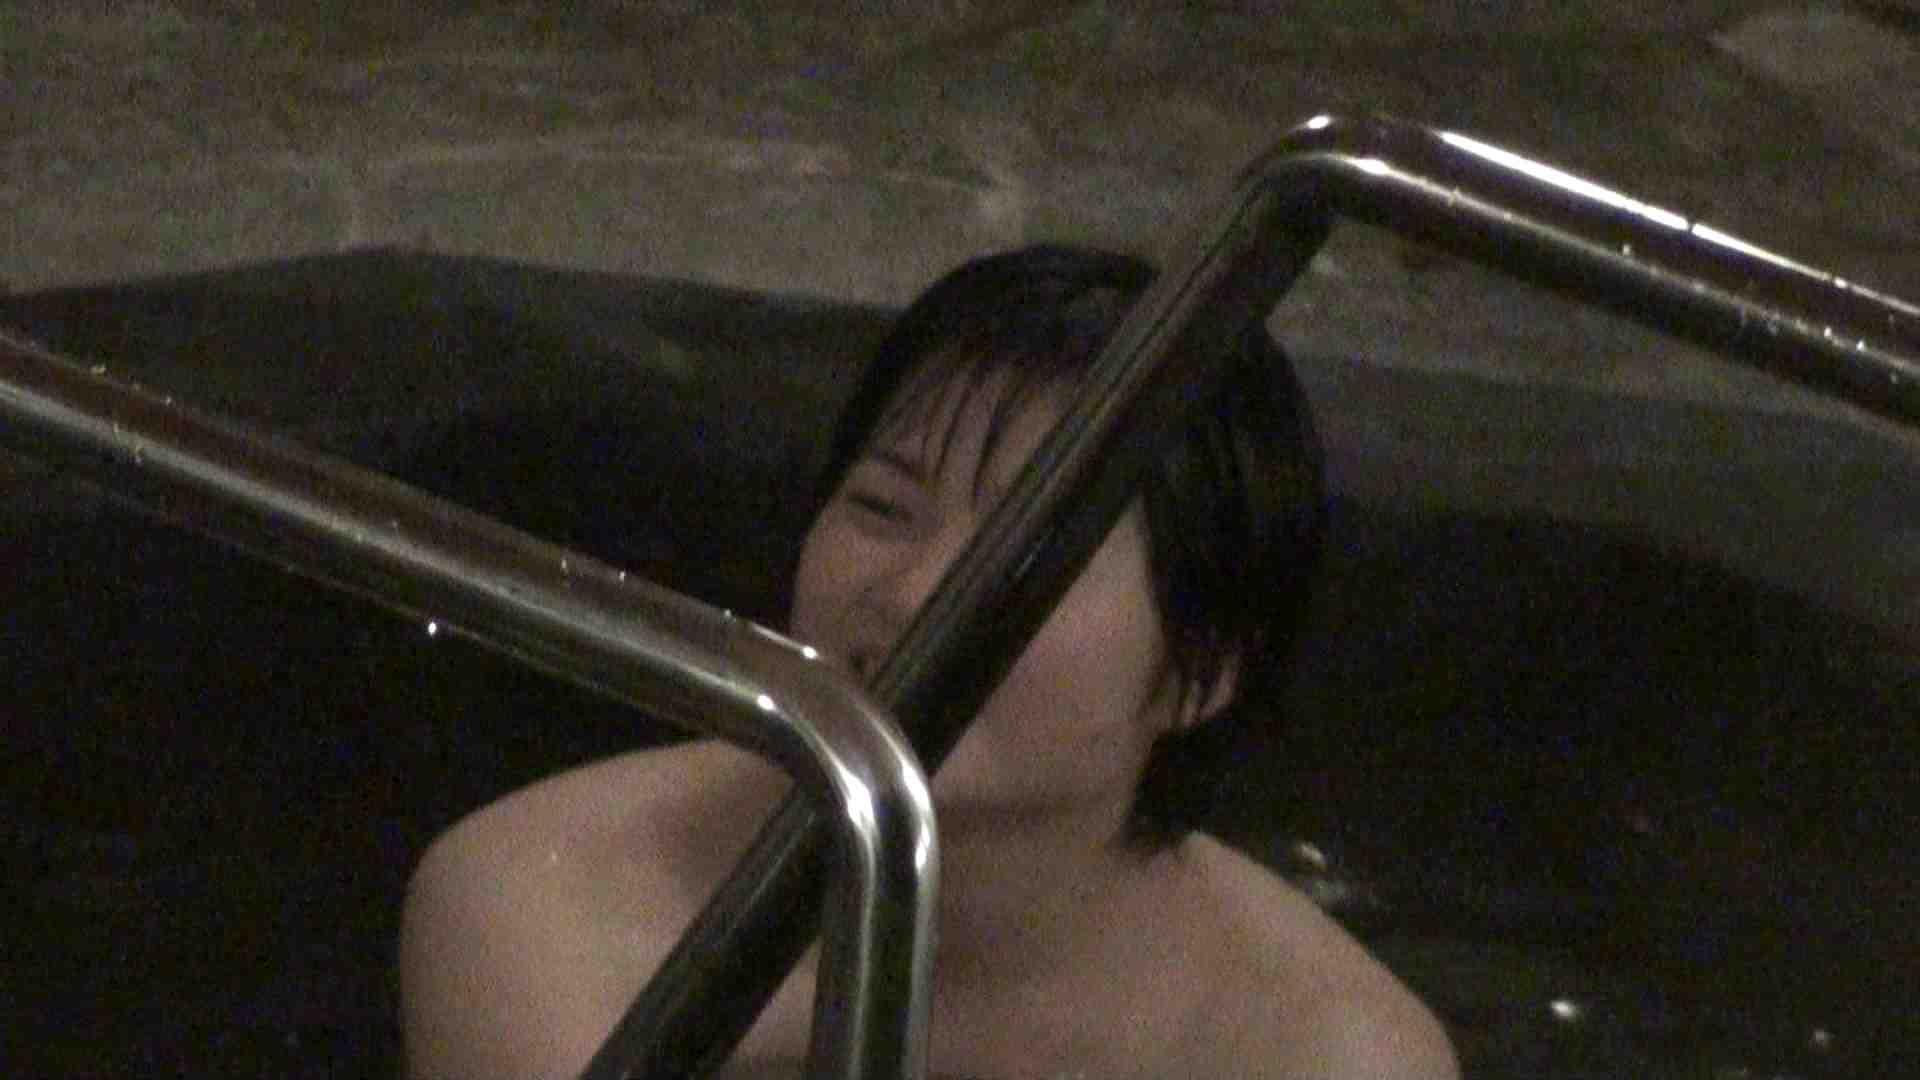 Aquaな露天風呂Vol.384 OLセックス | 盗撮  60画像 37